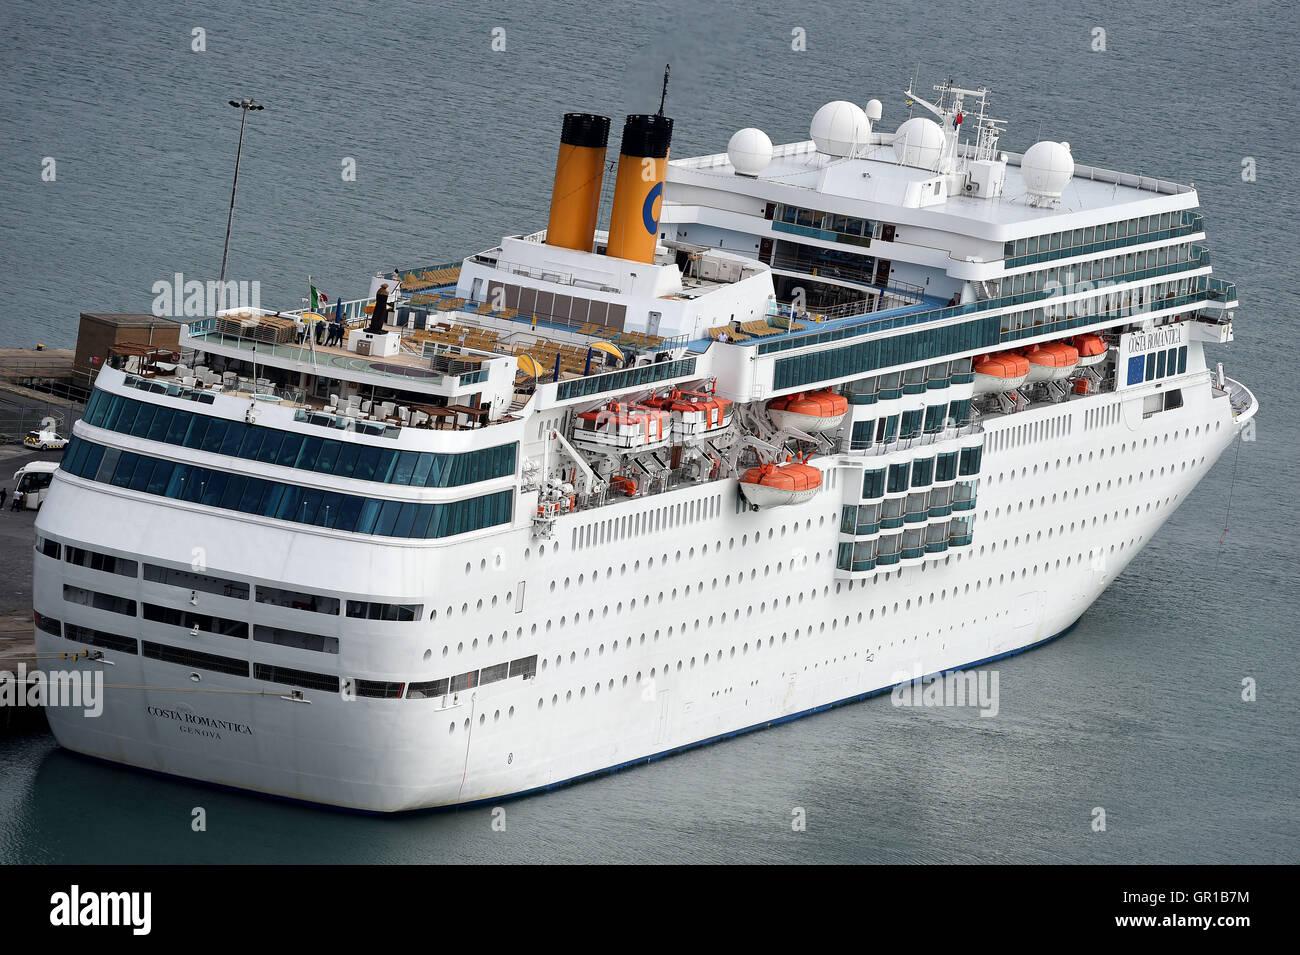 Costa Neoromantica Cruise Ship Stock Photo Alamy